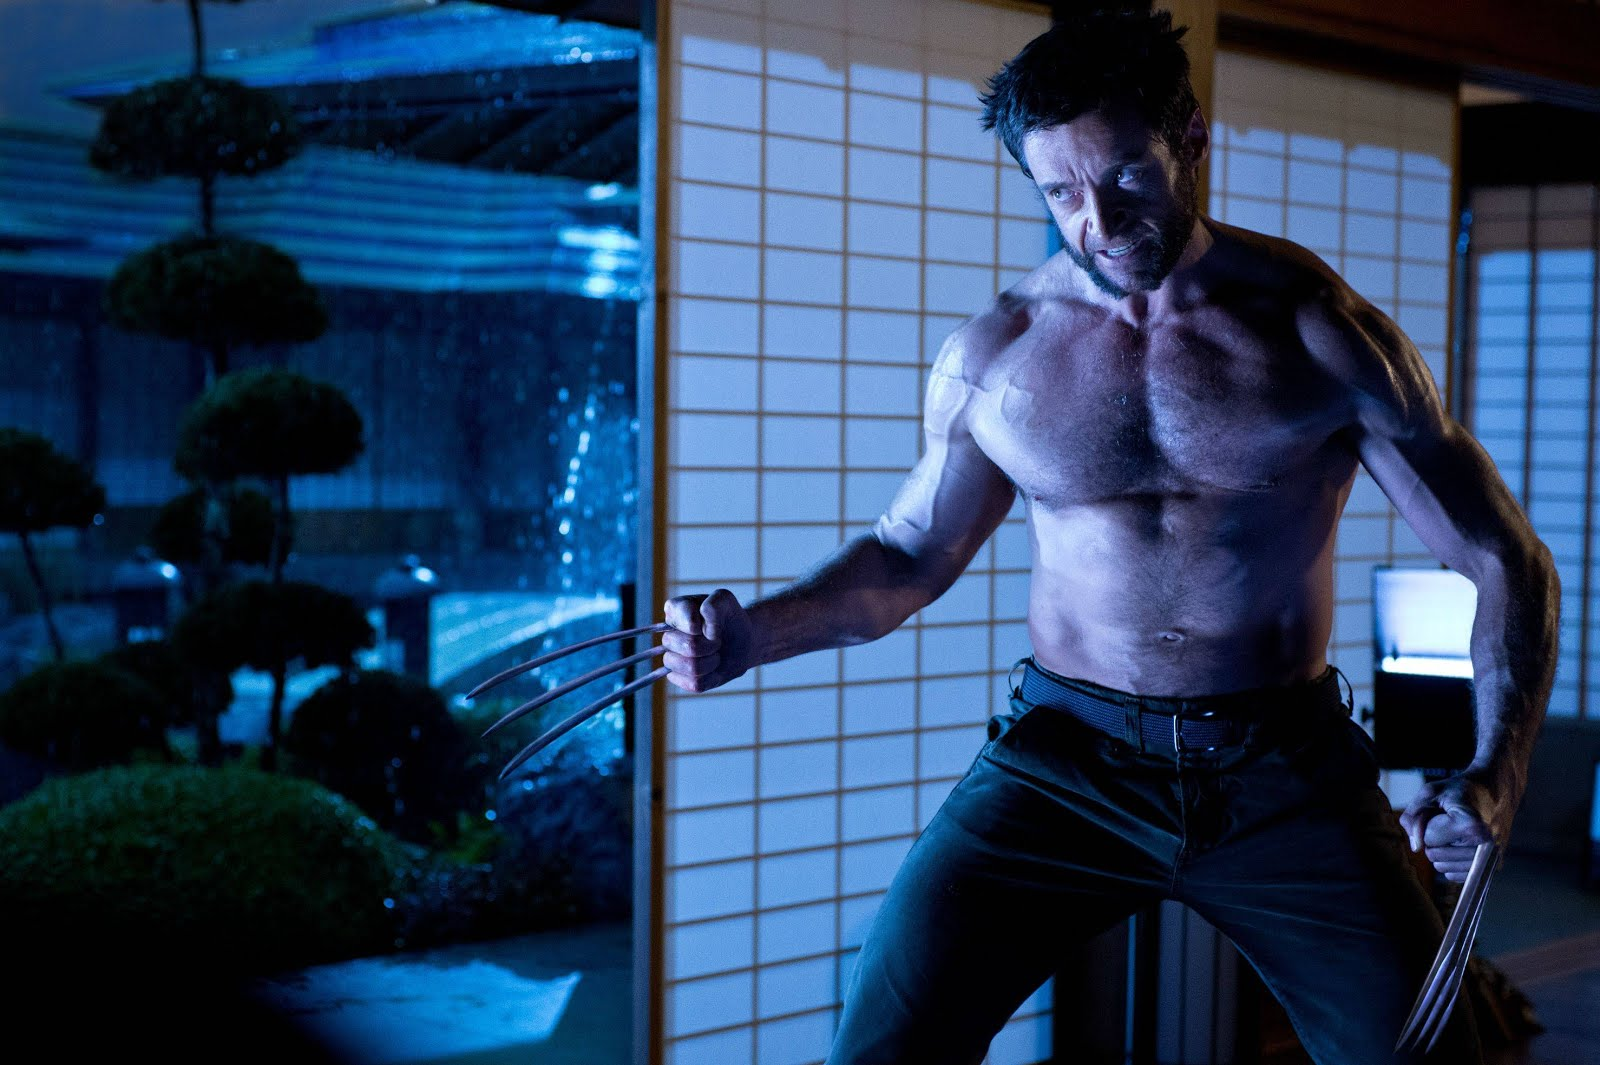 http://1.bp.blogspot.com/-ESBdff_xqoM/UPSSTWbRGyI/AAAAAAAAAFA/HVrJolIaCDA/s1600/The-Wolverine-Hugh-Jackman.jpg